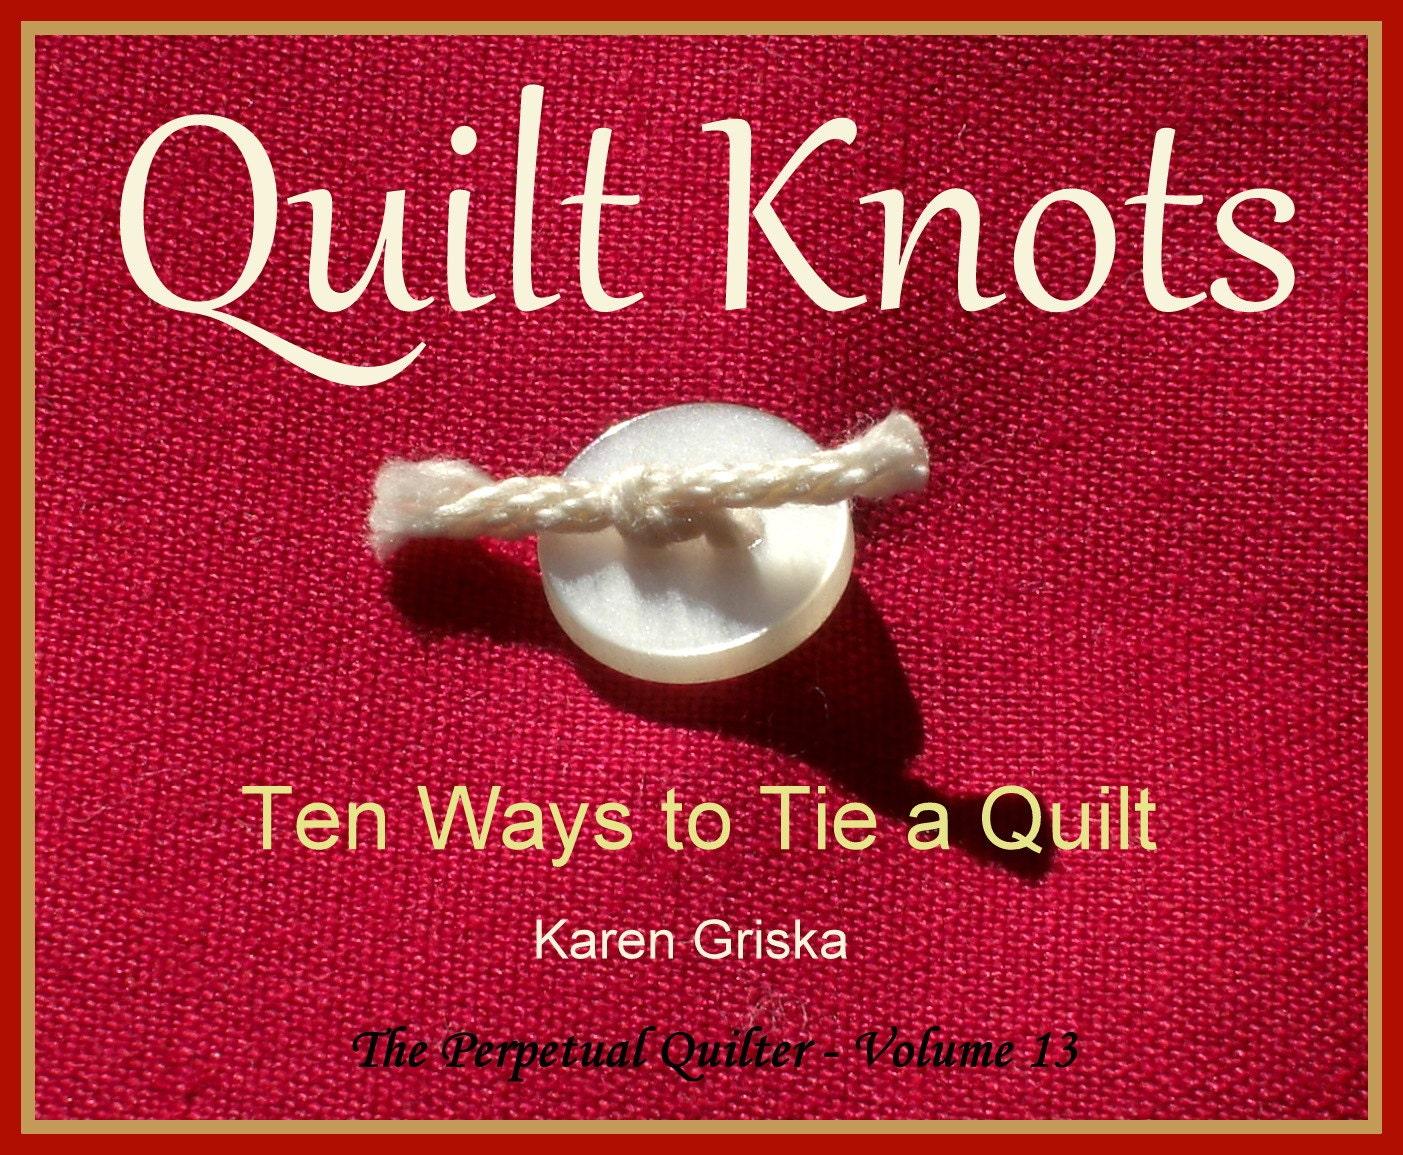 Quilt Knots Quilt Pattern Ten Ways to Tie a Quilt How to : tie knot quilt - Adamdwight.com